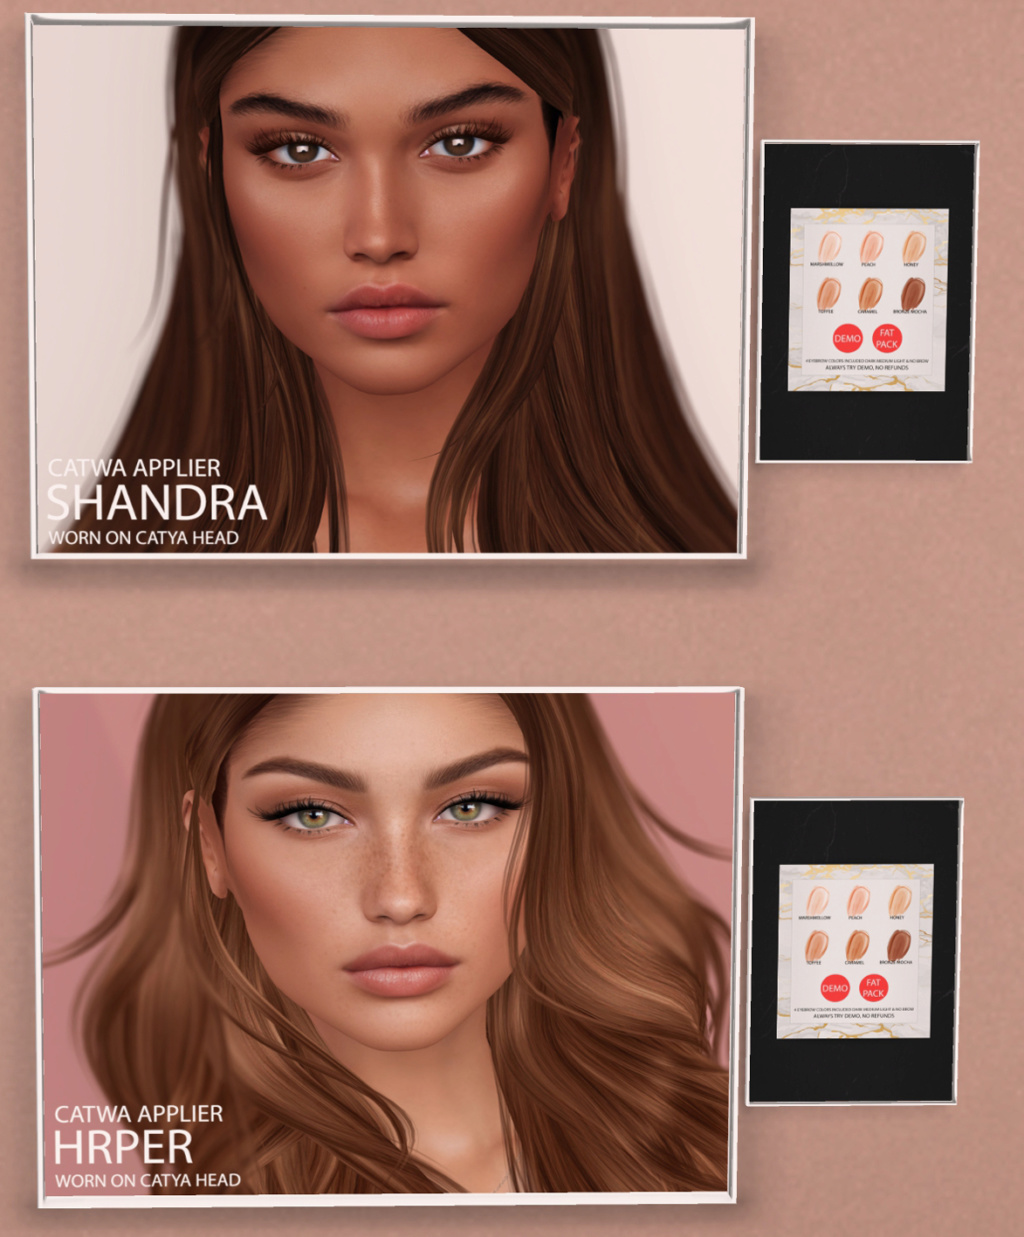 [Femme] Zoul Creations & Amara beauty - Page 2 Zzrif146